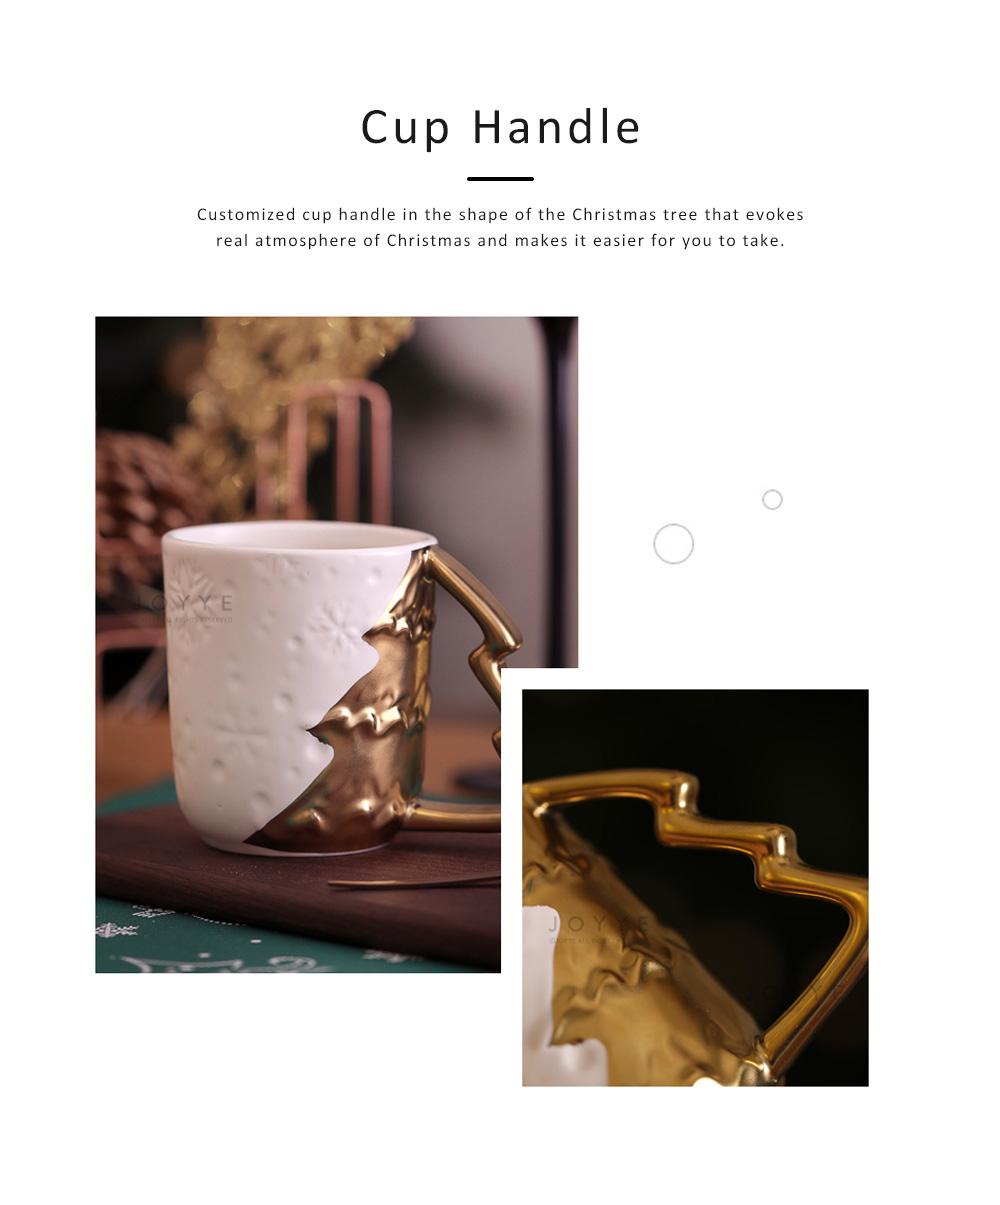 Ceramic Mug Cup with Glaze for Tea, Milk, Coffee, Water, Decoration Cup for Christmas, Festivals, Cartoon Water Mug 1